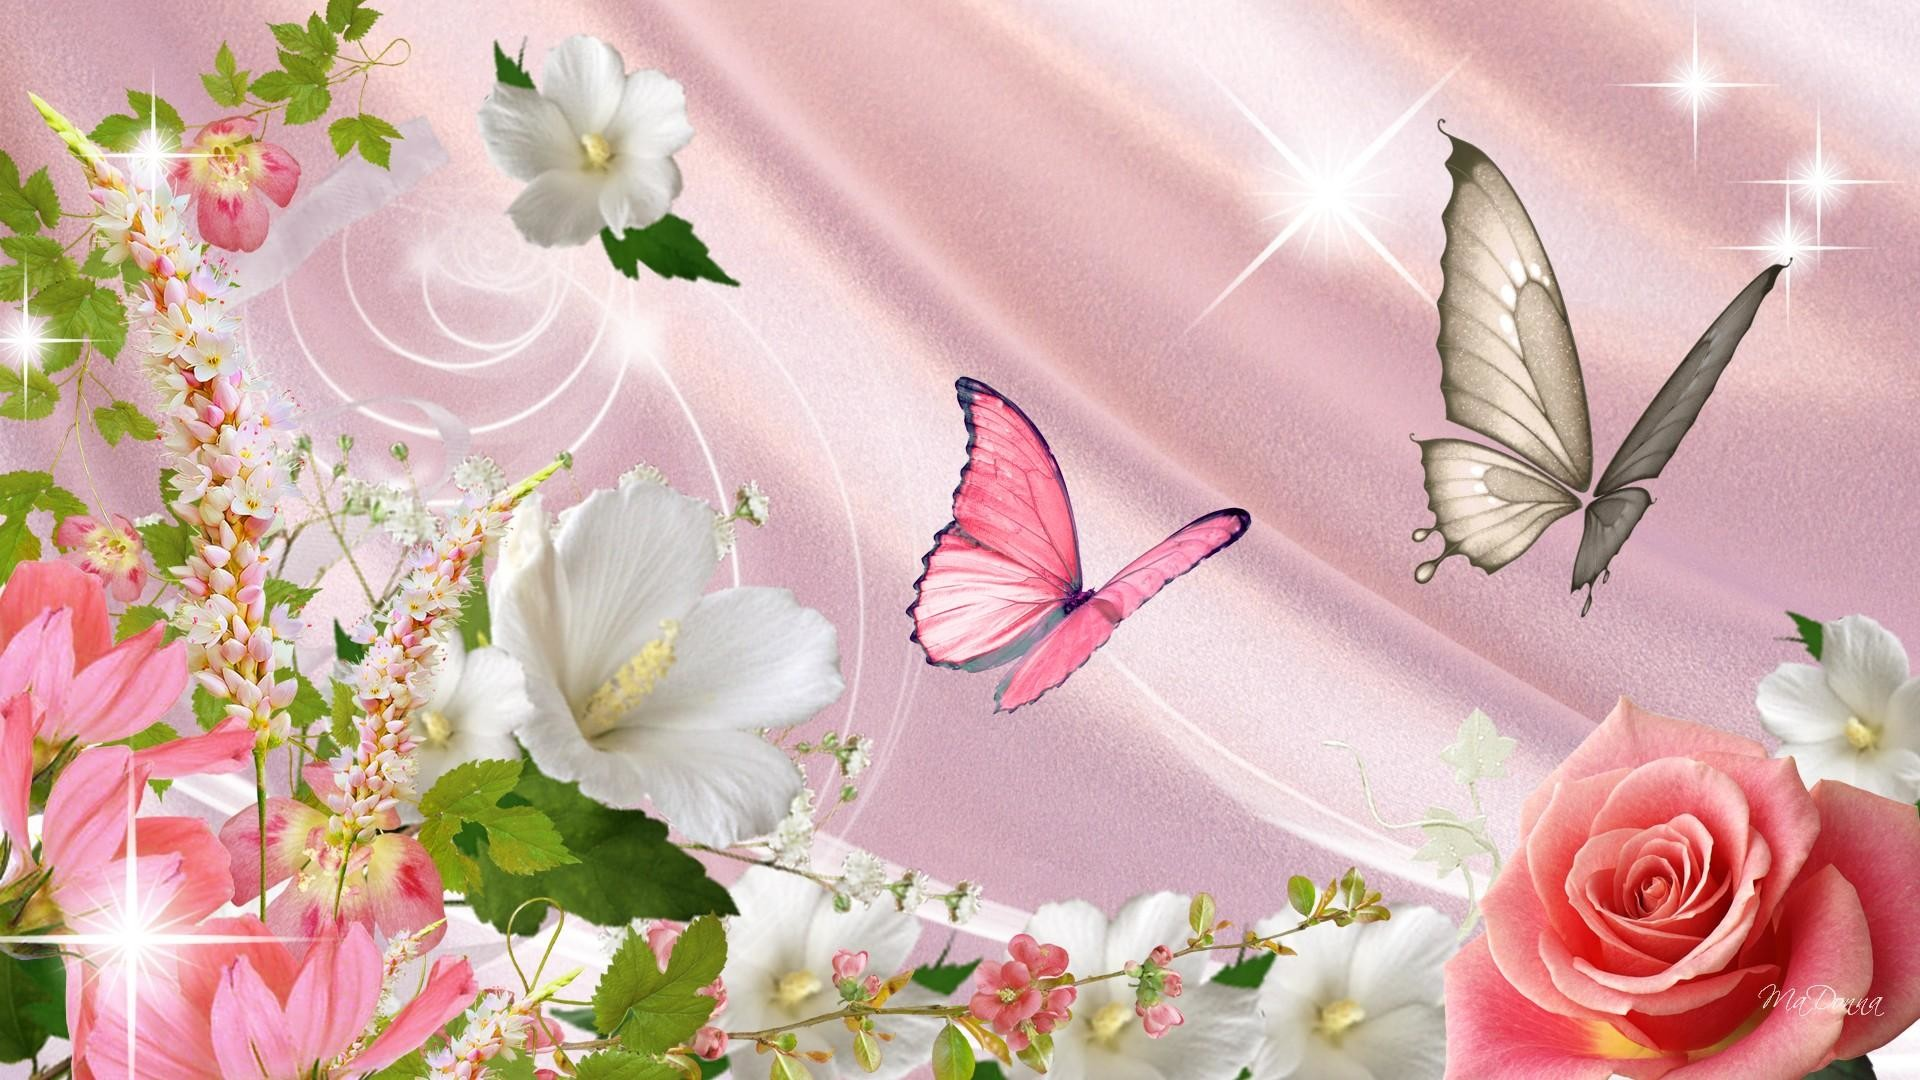 Wallpaper Butterflies and Flowers – WallpaperSafari